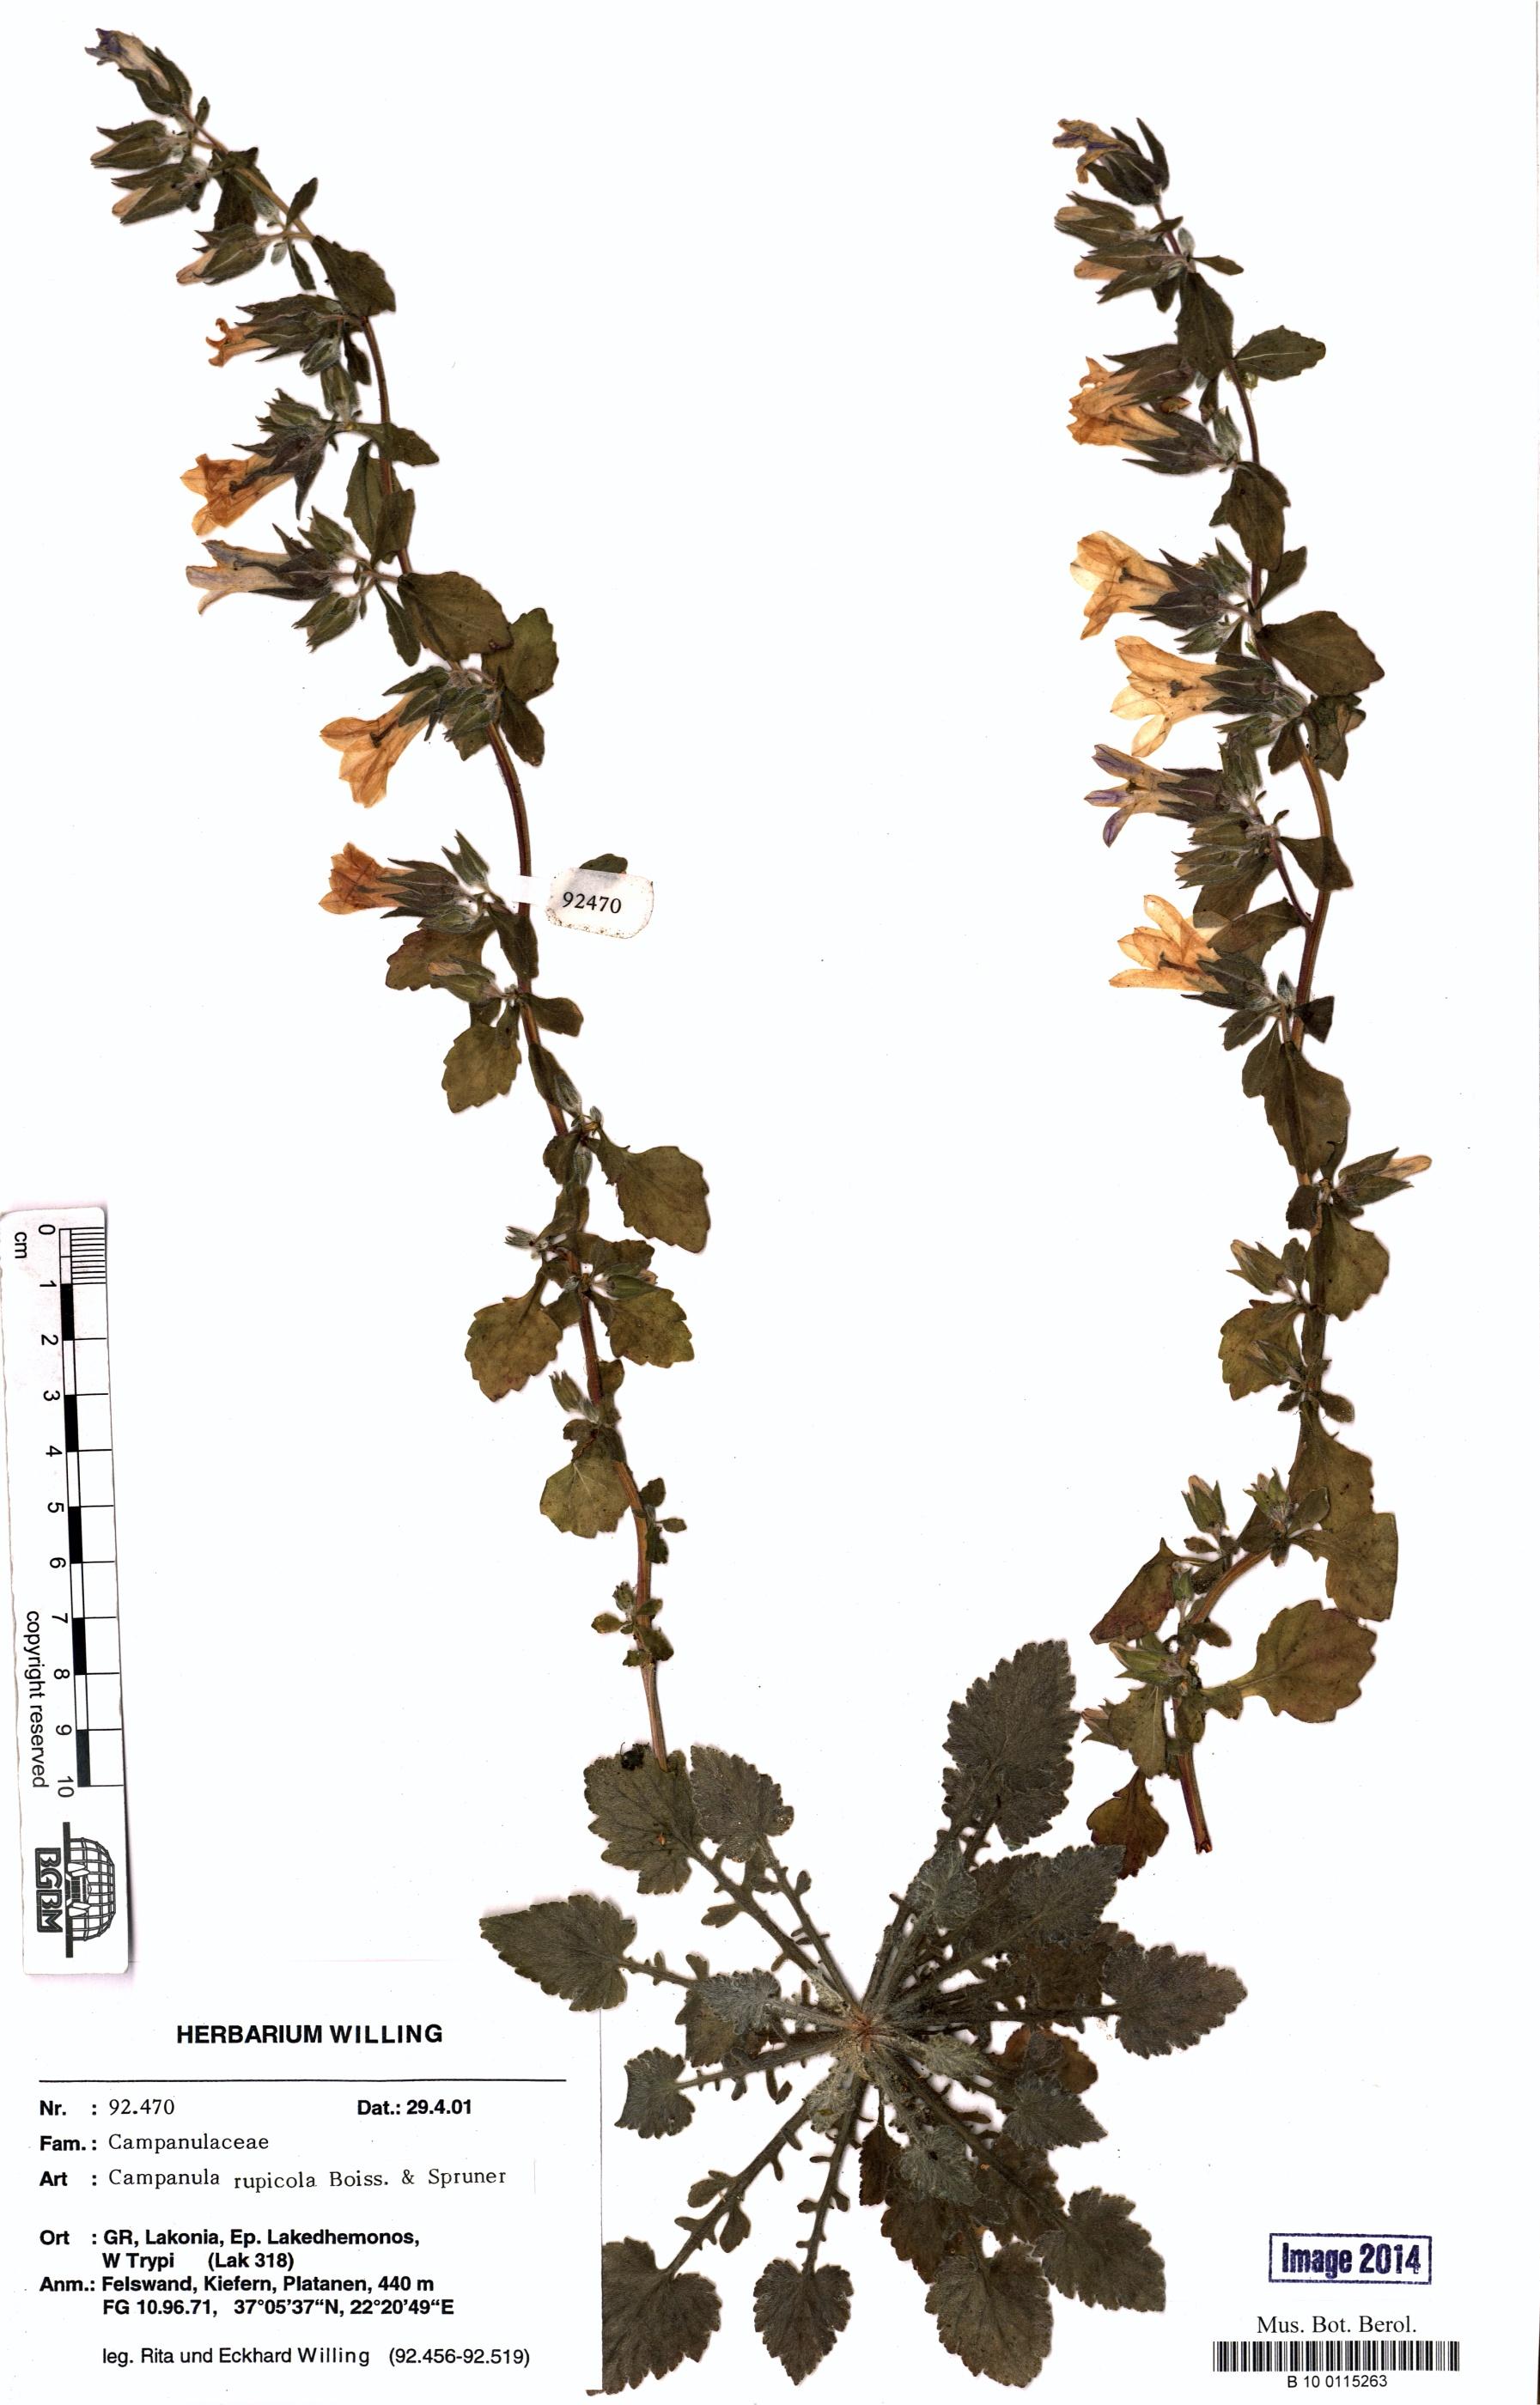 http://ww2.bgbm.org/herbarium/images/B/10/01/15/26/B_10_0115263.jpg